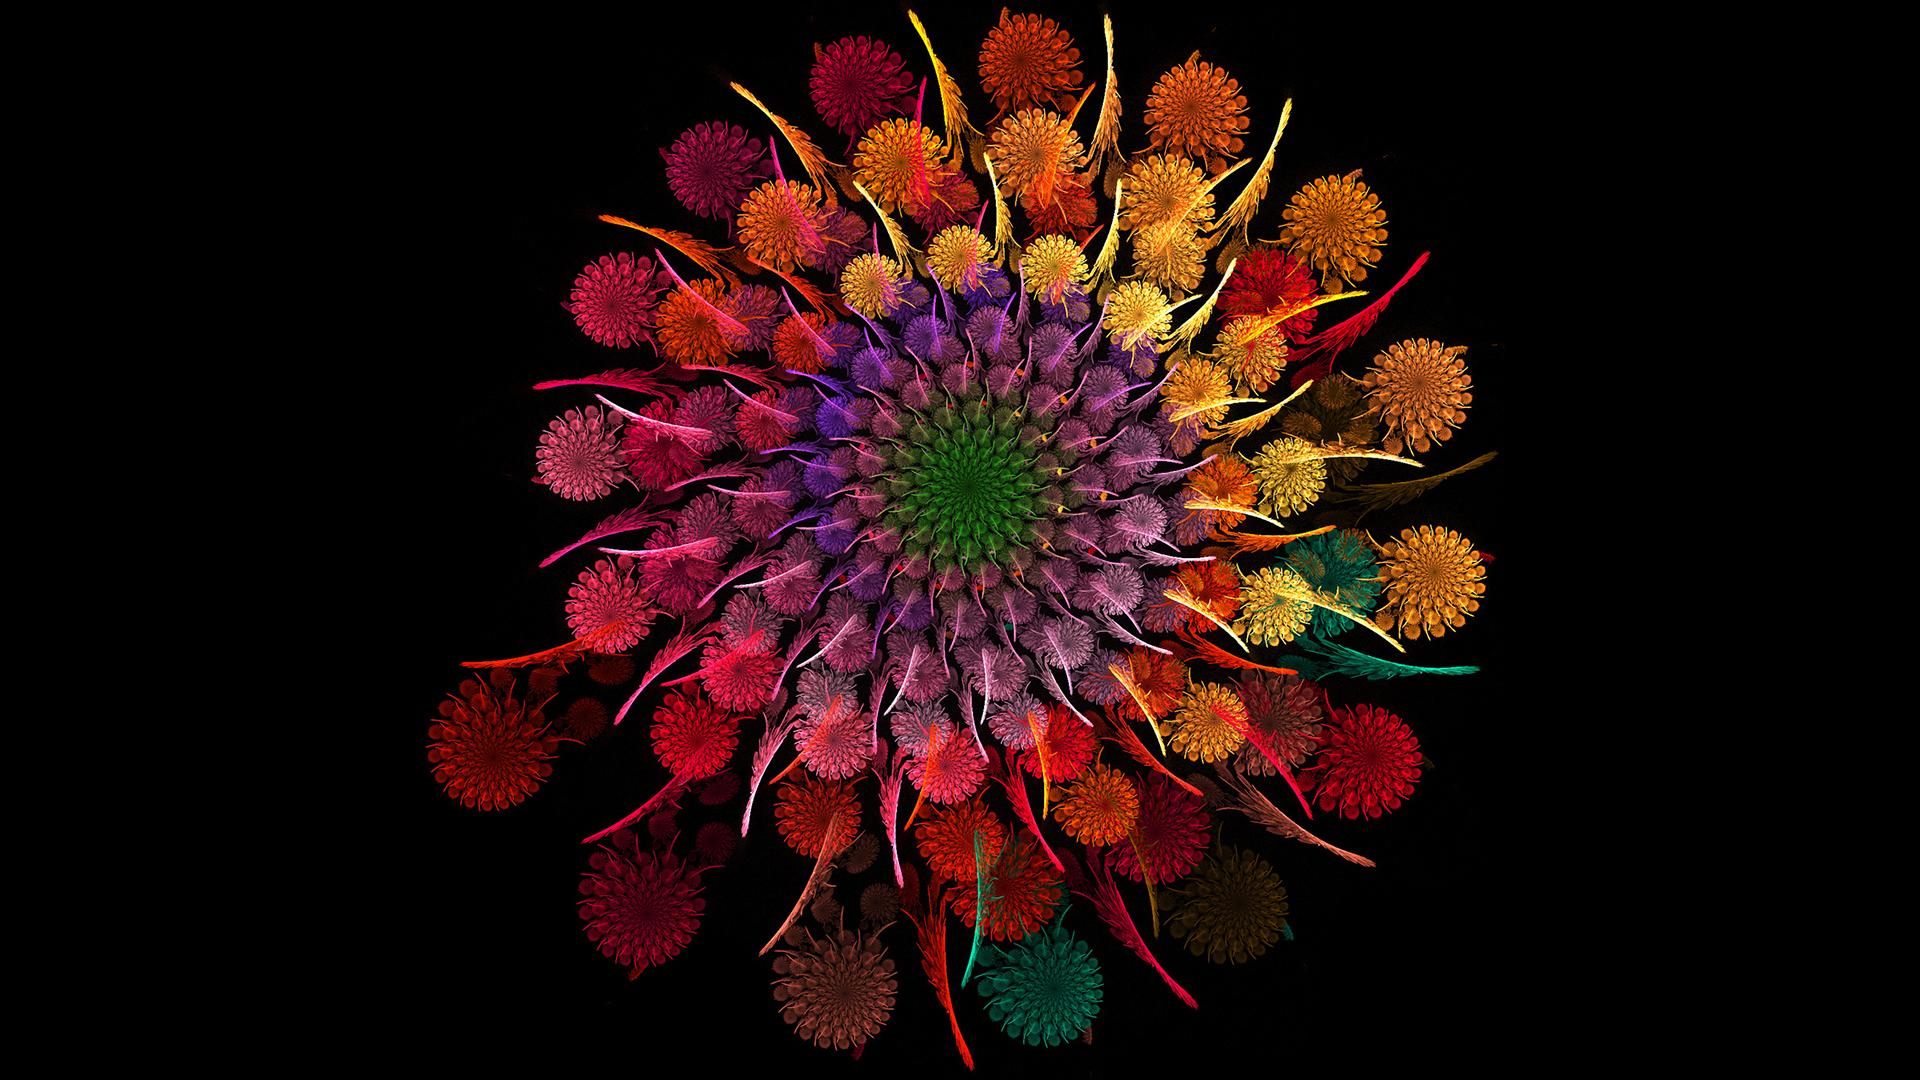 [44+] Widescreen Desktop Wallpaper Dark Flower on ...